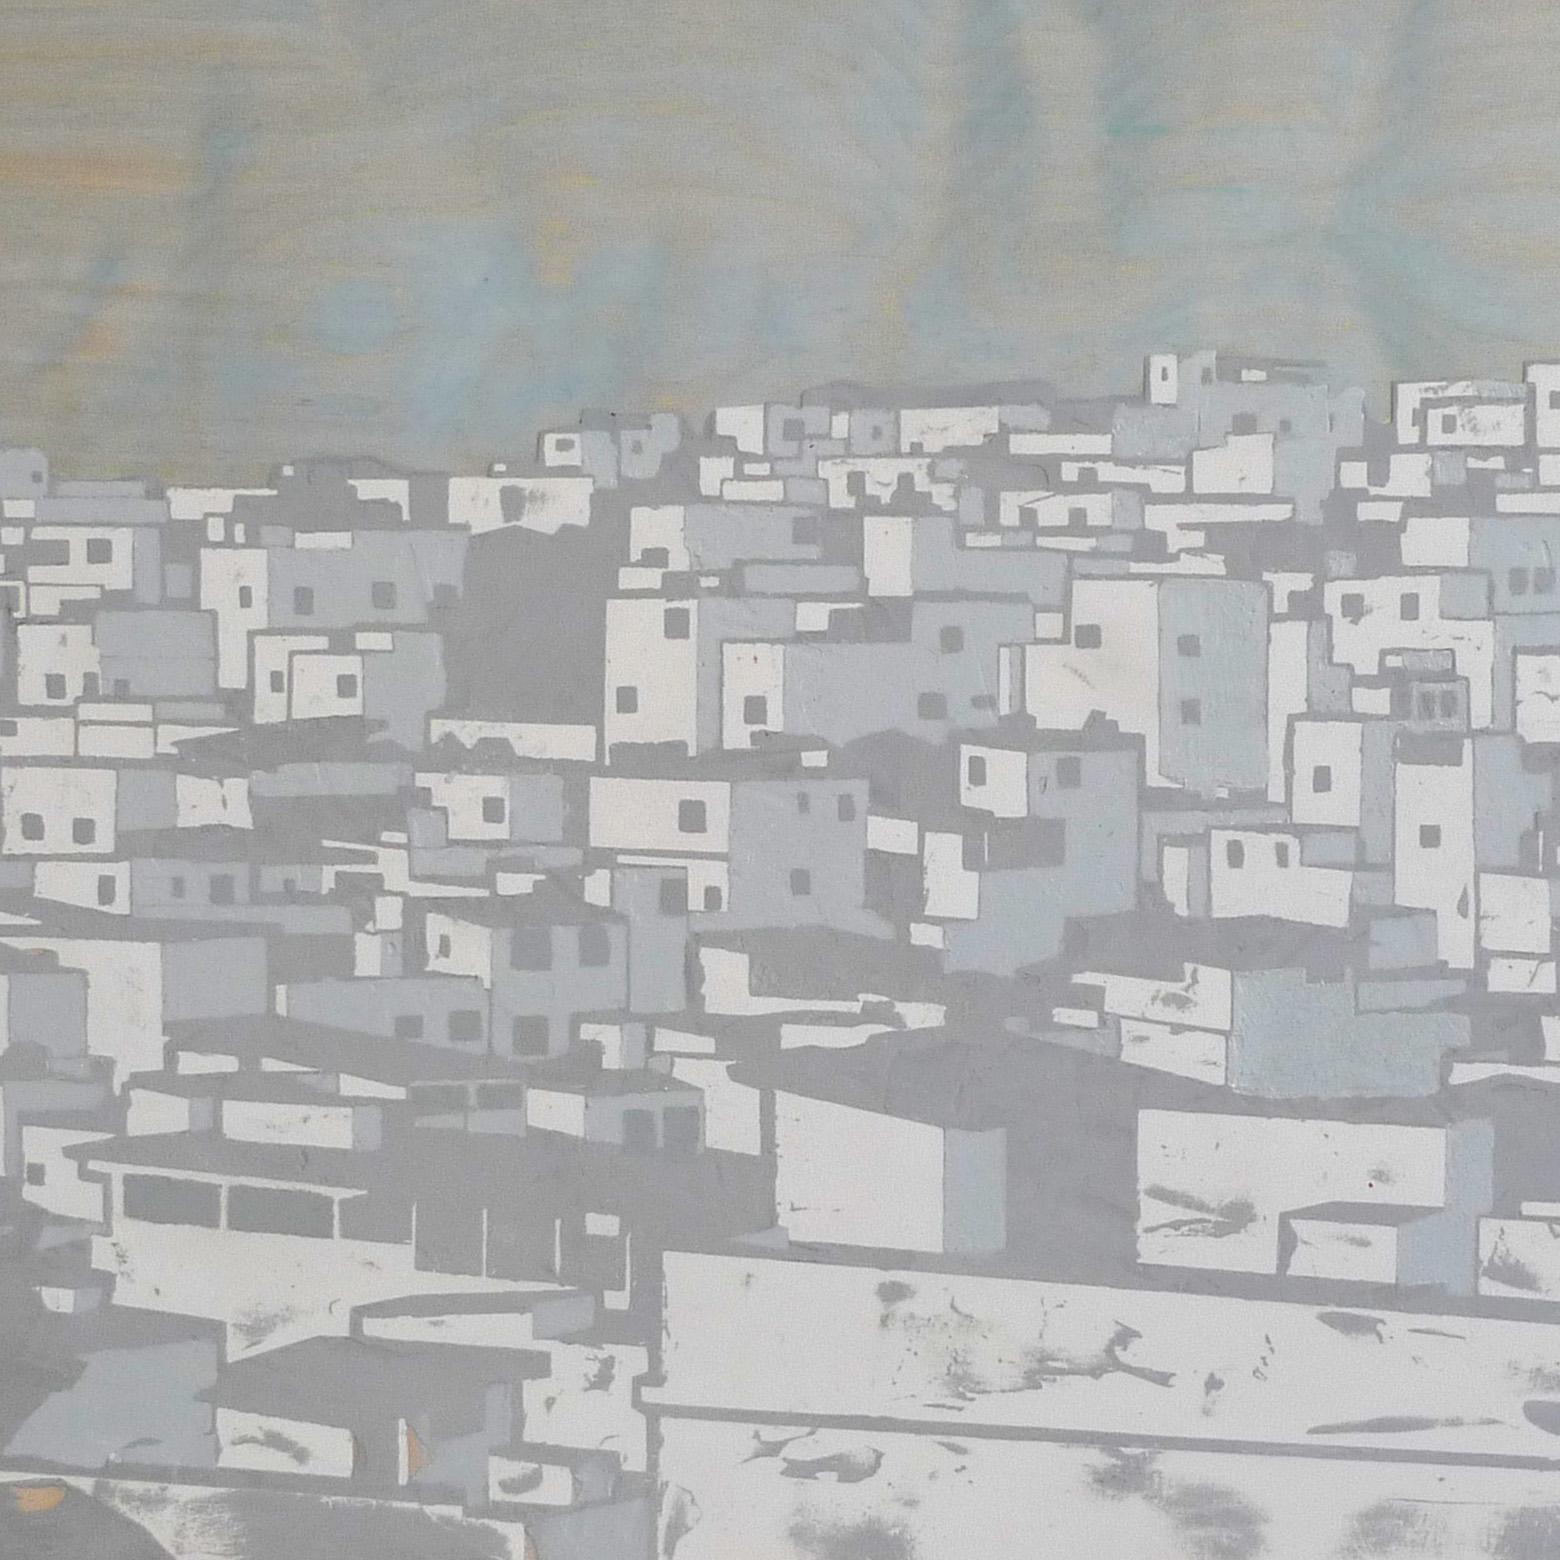 vila cruzeiro study_1.jpg